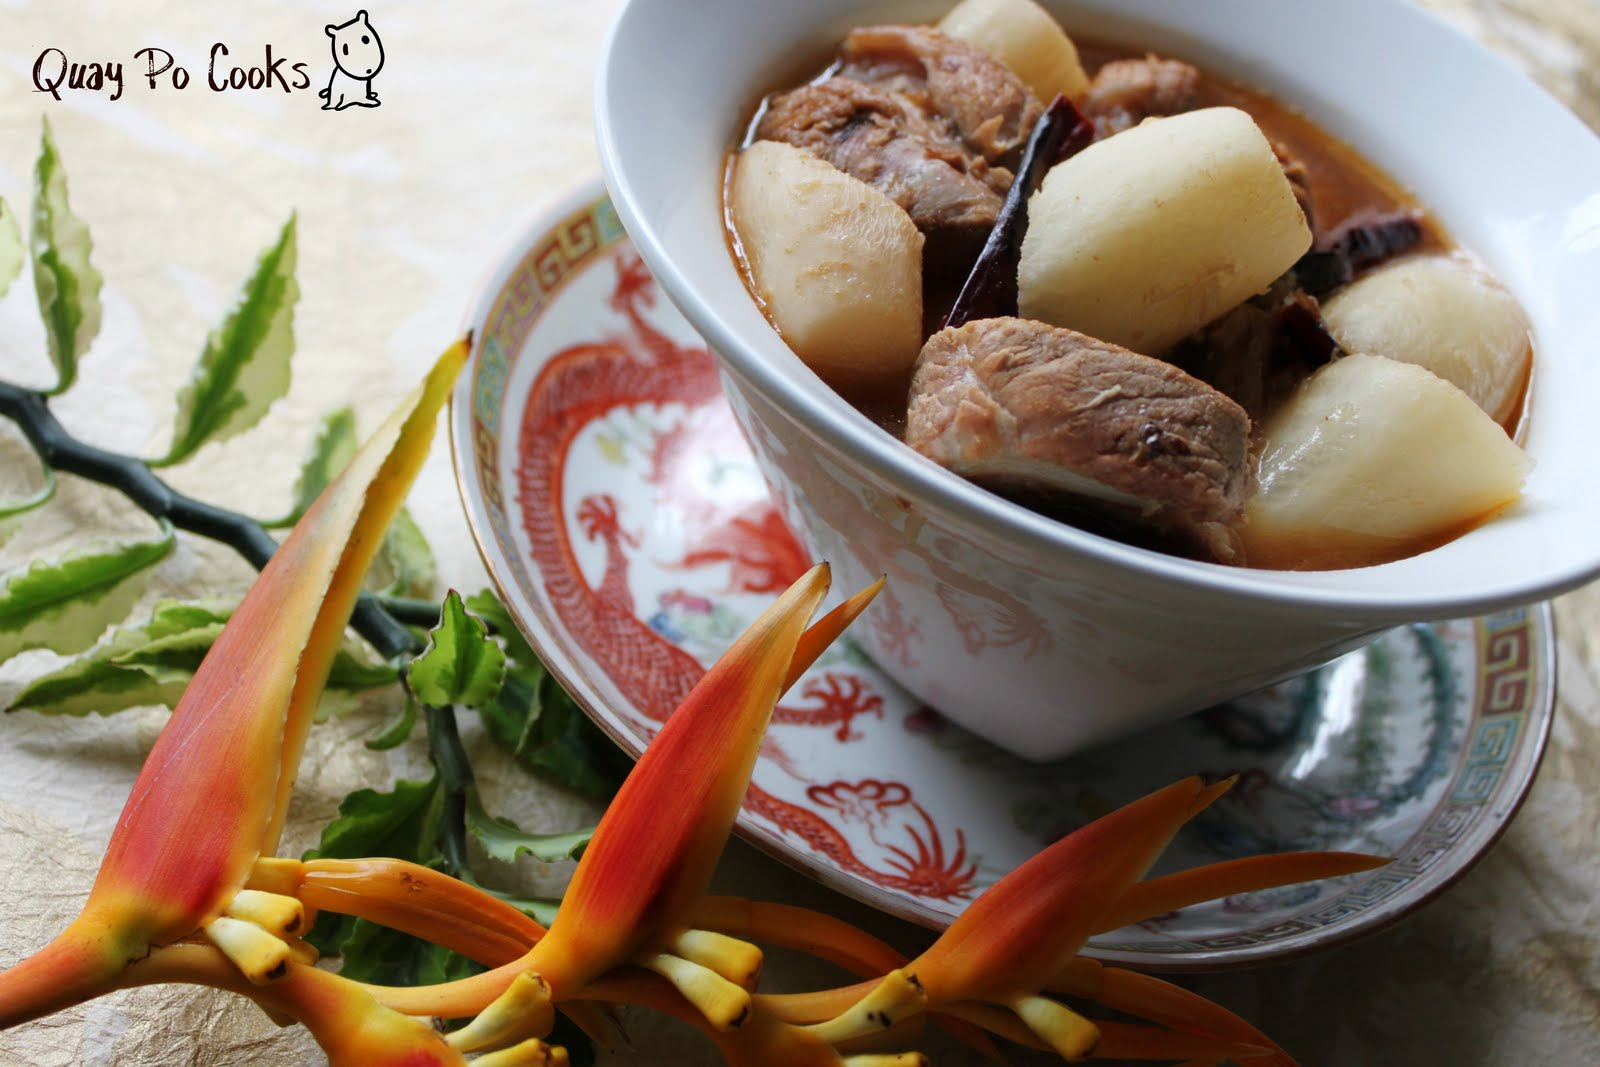 Quay Po Cooks: Stewed Lo Bak (turnip) & Pork Ribs - Mummy's Recipe is...